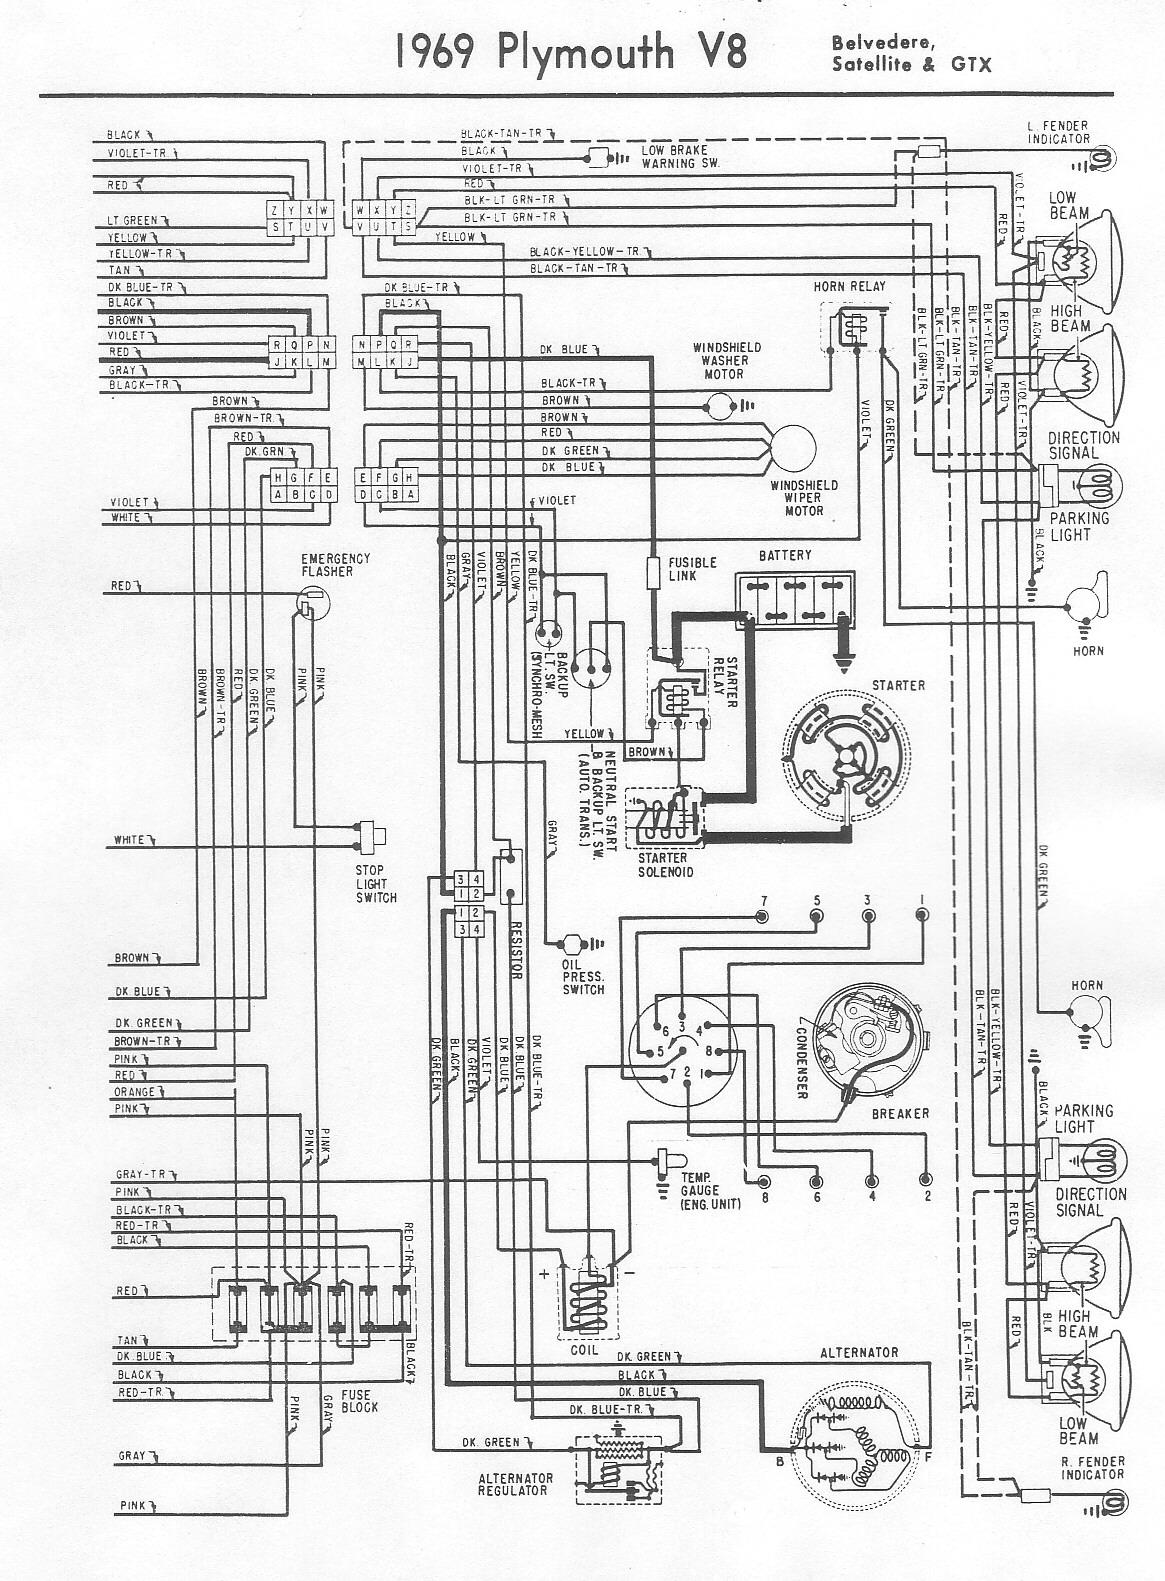 1971 spitfire wiring diagram wiring diagram